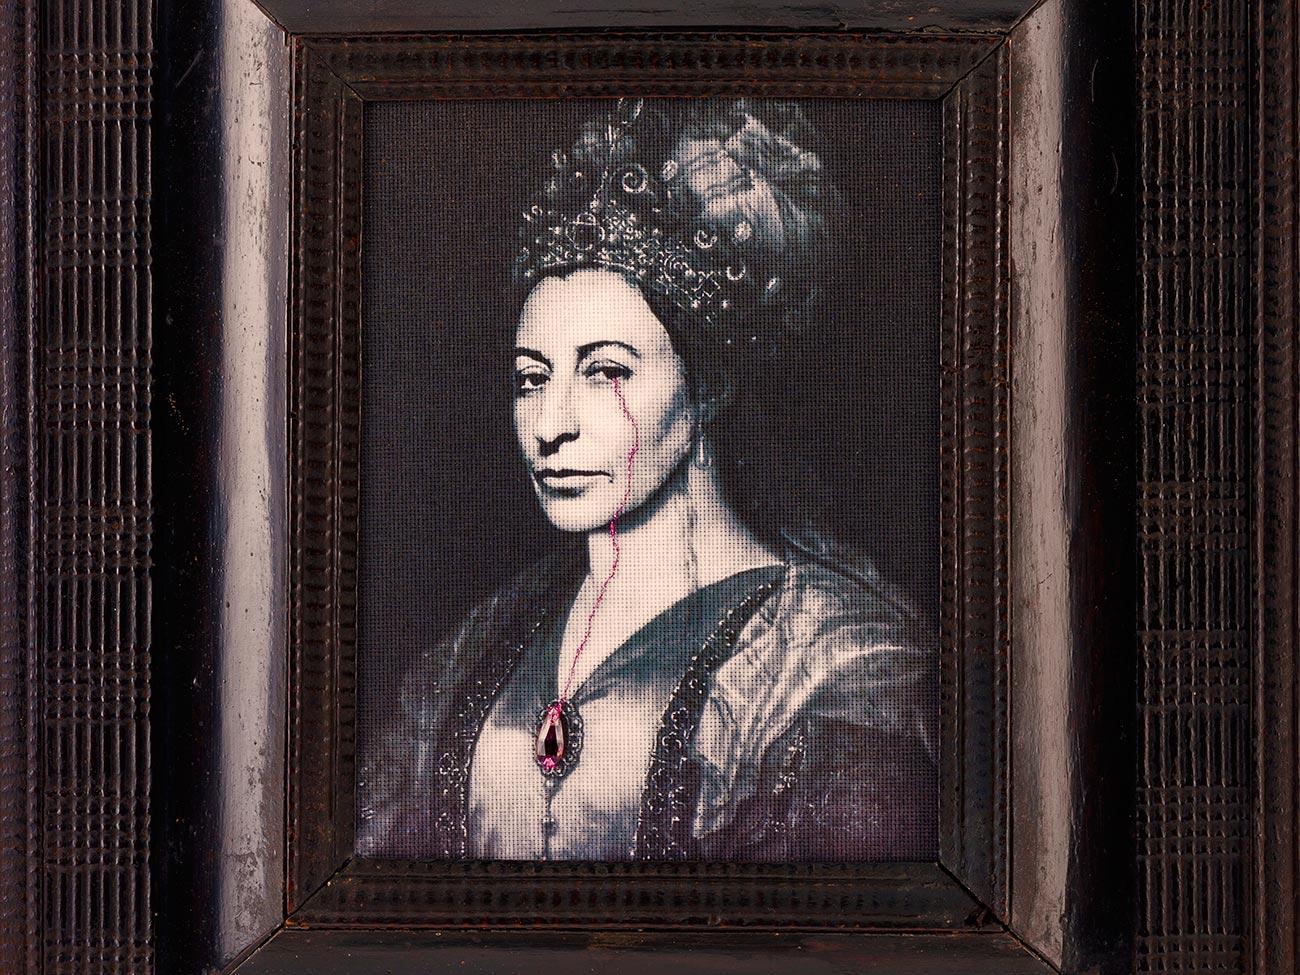 M.PRADA  : THE ONE-WOMAN-SHOW